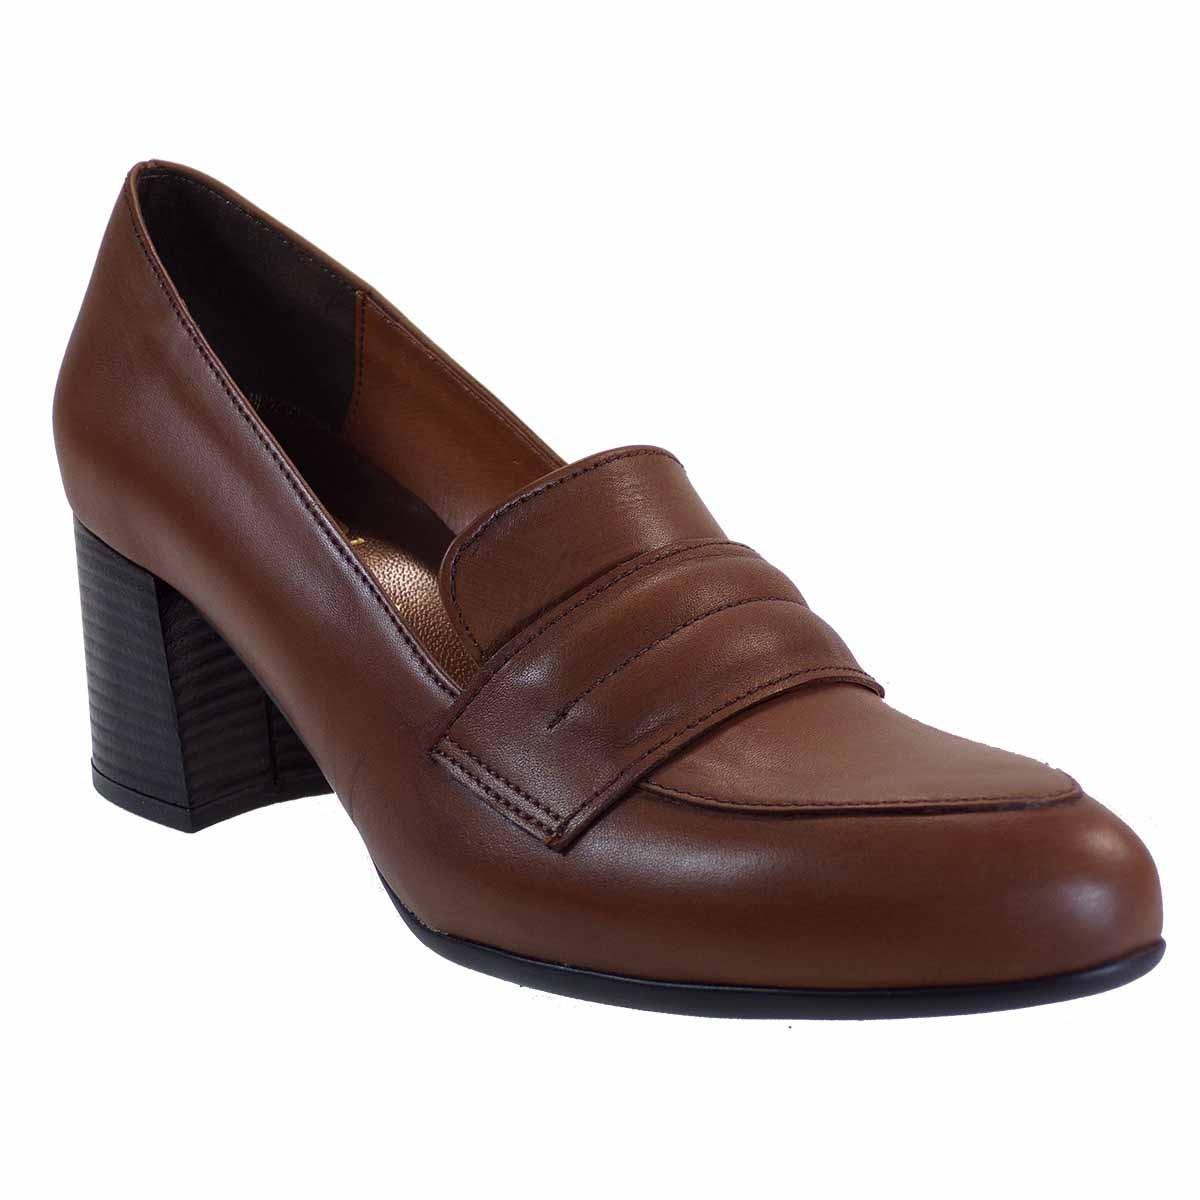 Katia Shoes Γυναικεία Παπούτσια Γόβες Κ44-1809 Ταμπά Δέρμα